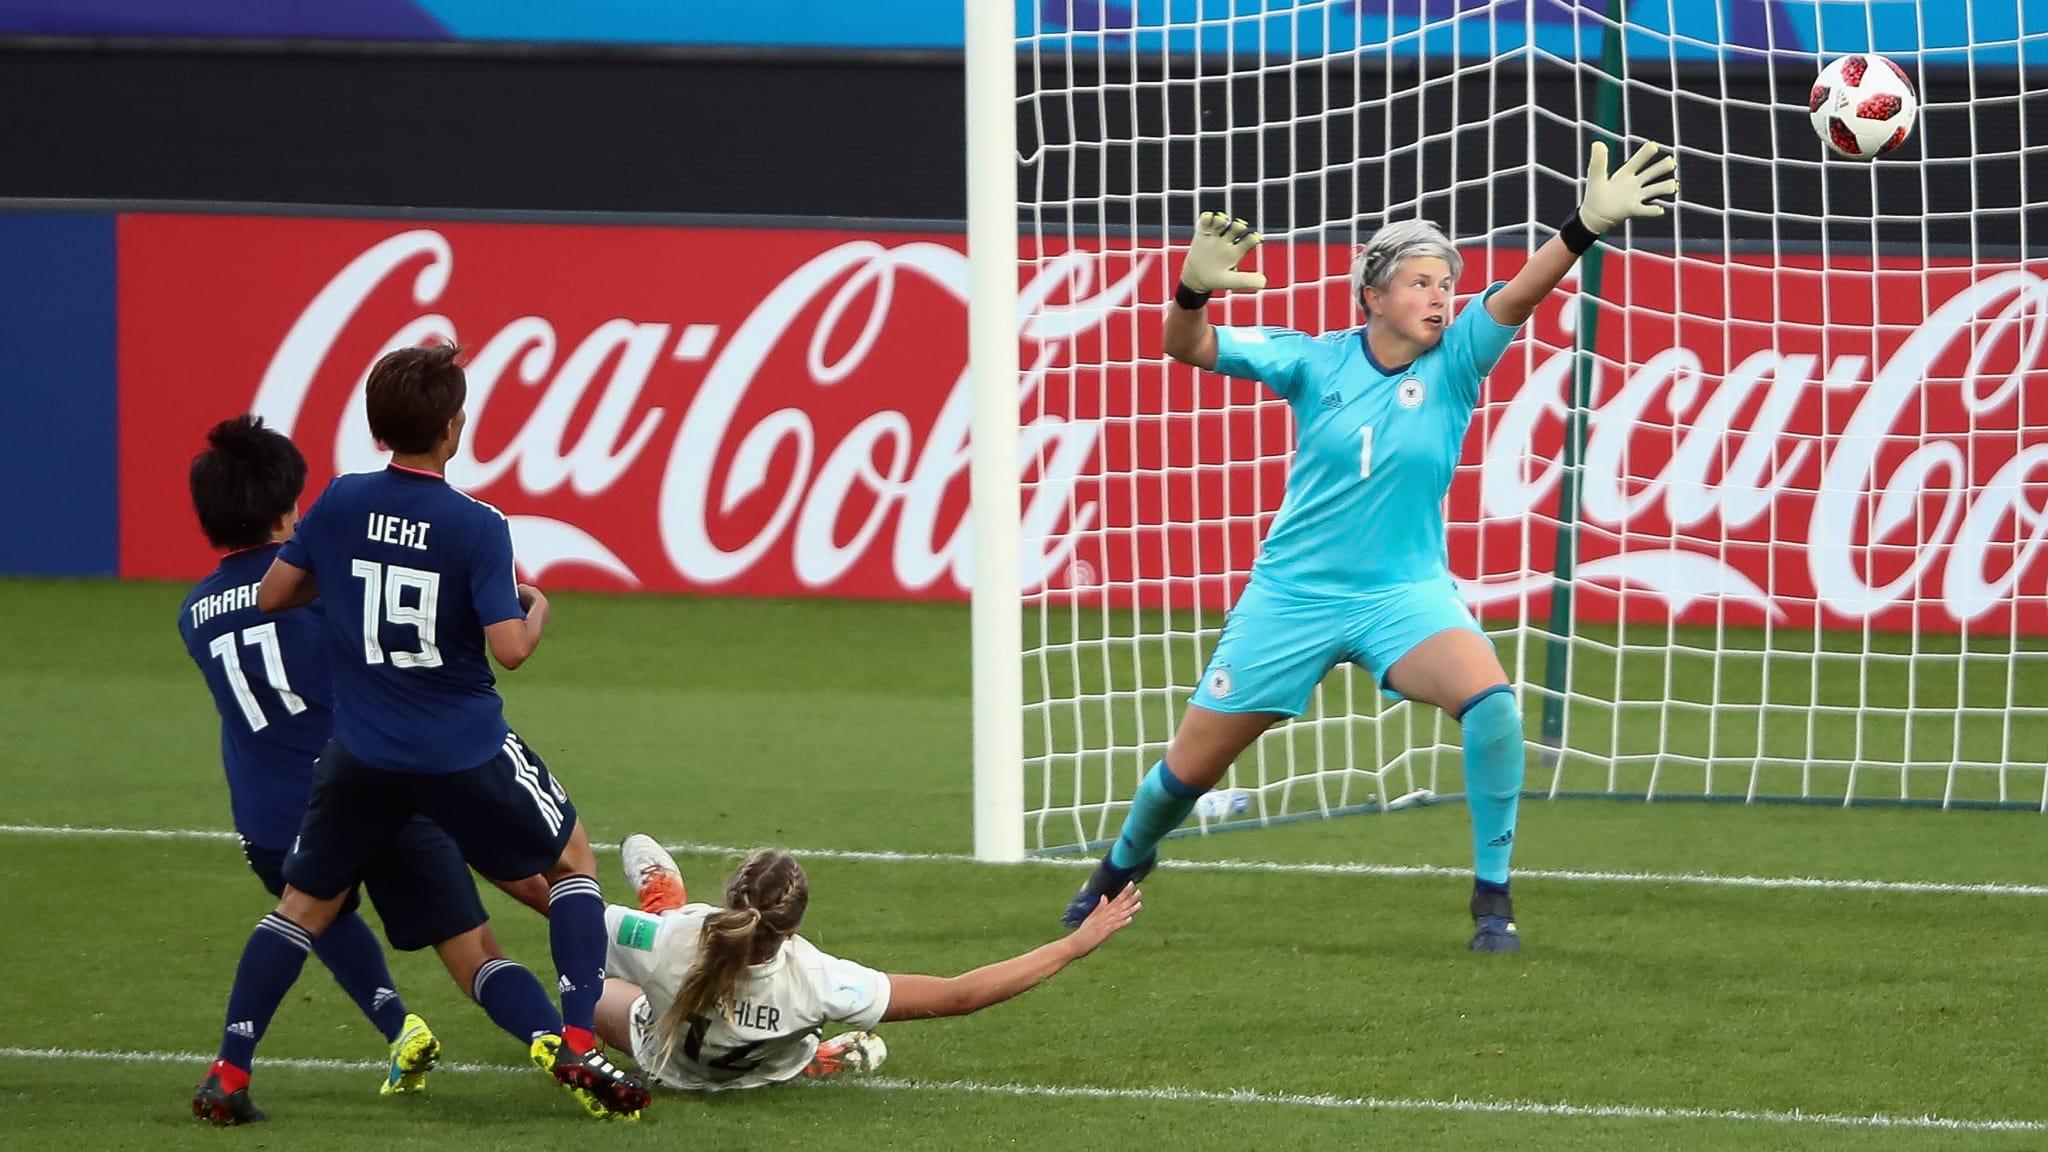 Germany v Japan: Saori Takarada of Japan scores her team's third goal